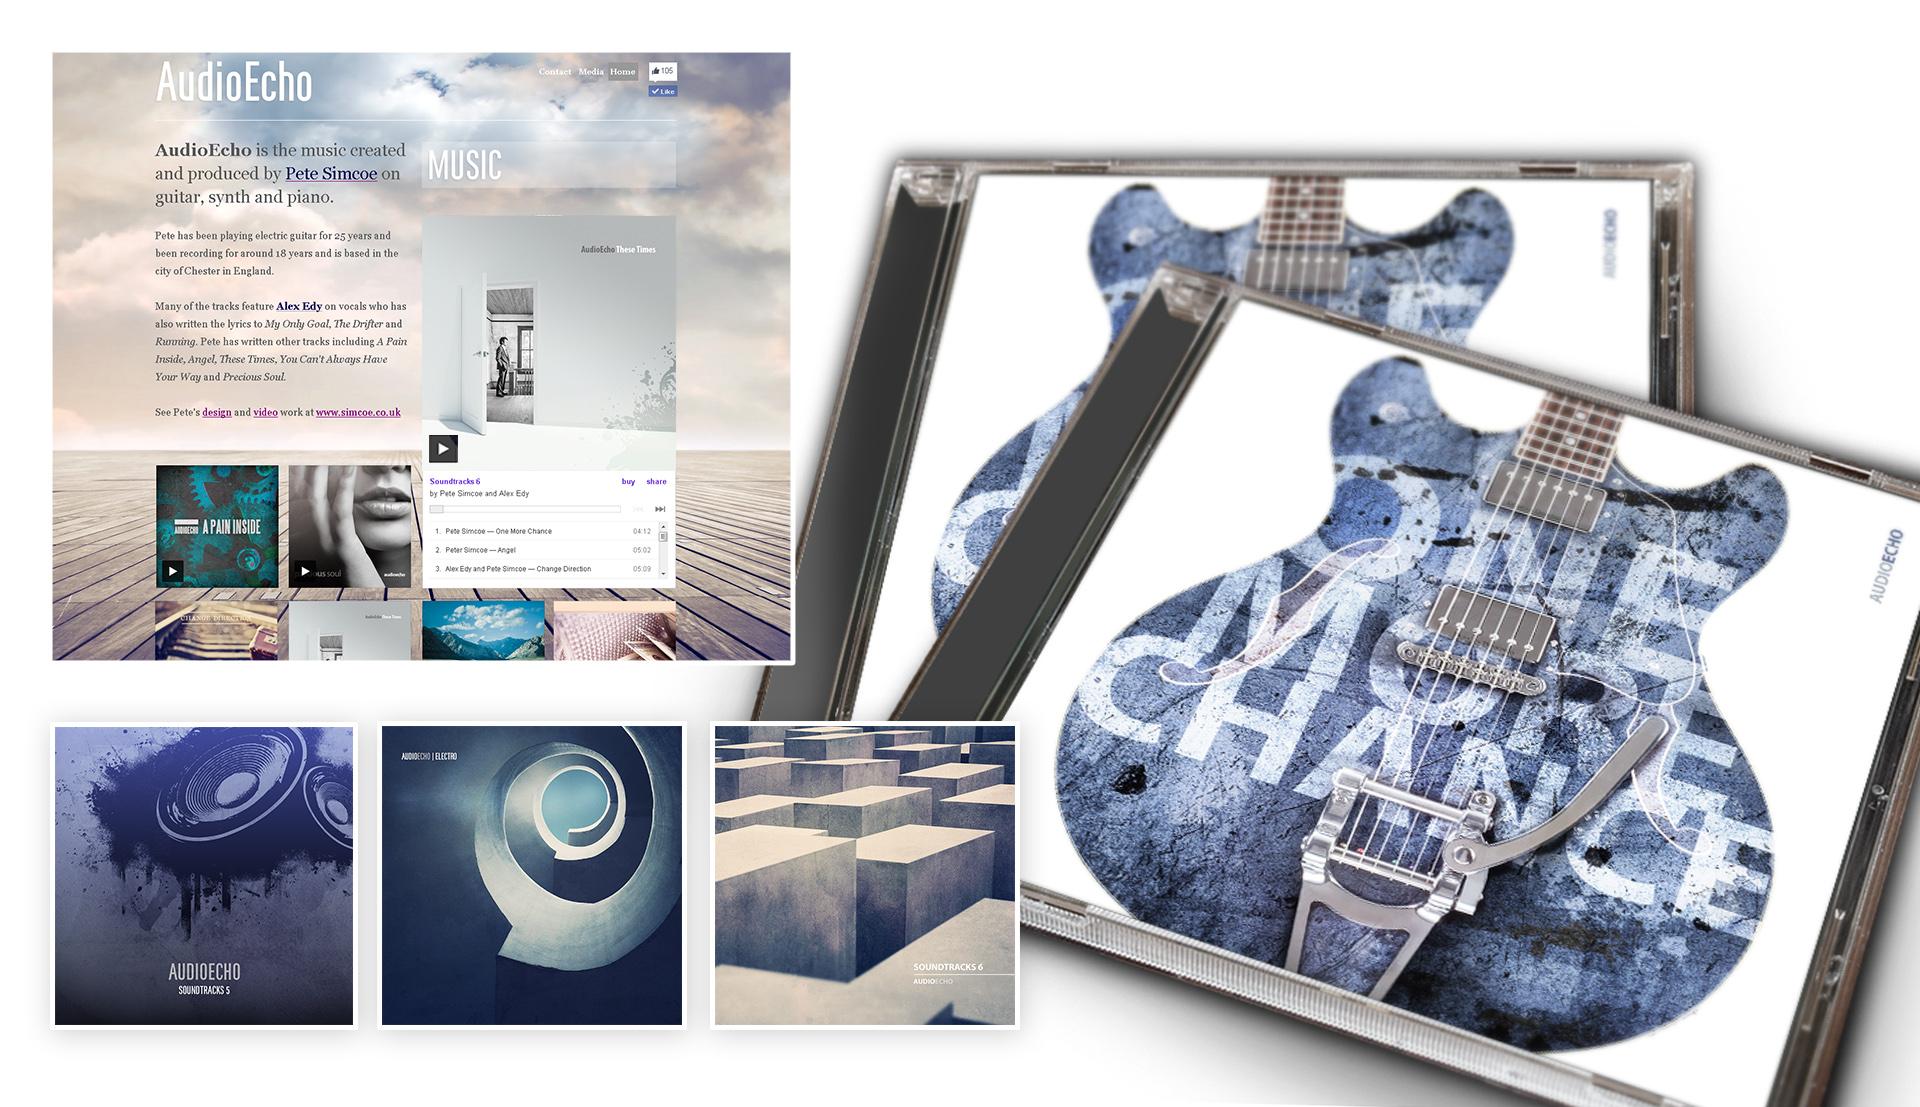 AudioEcho music artwork and website design